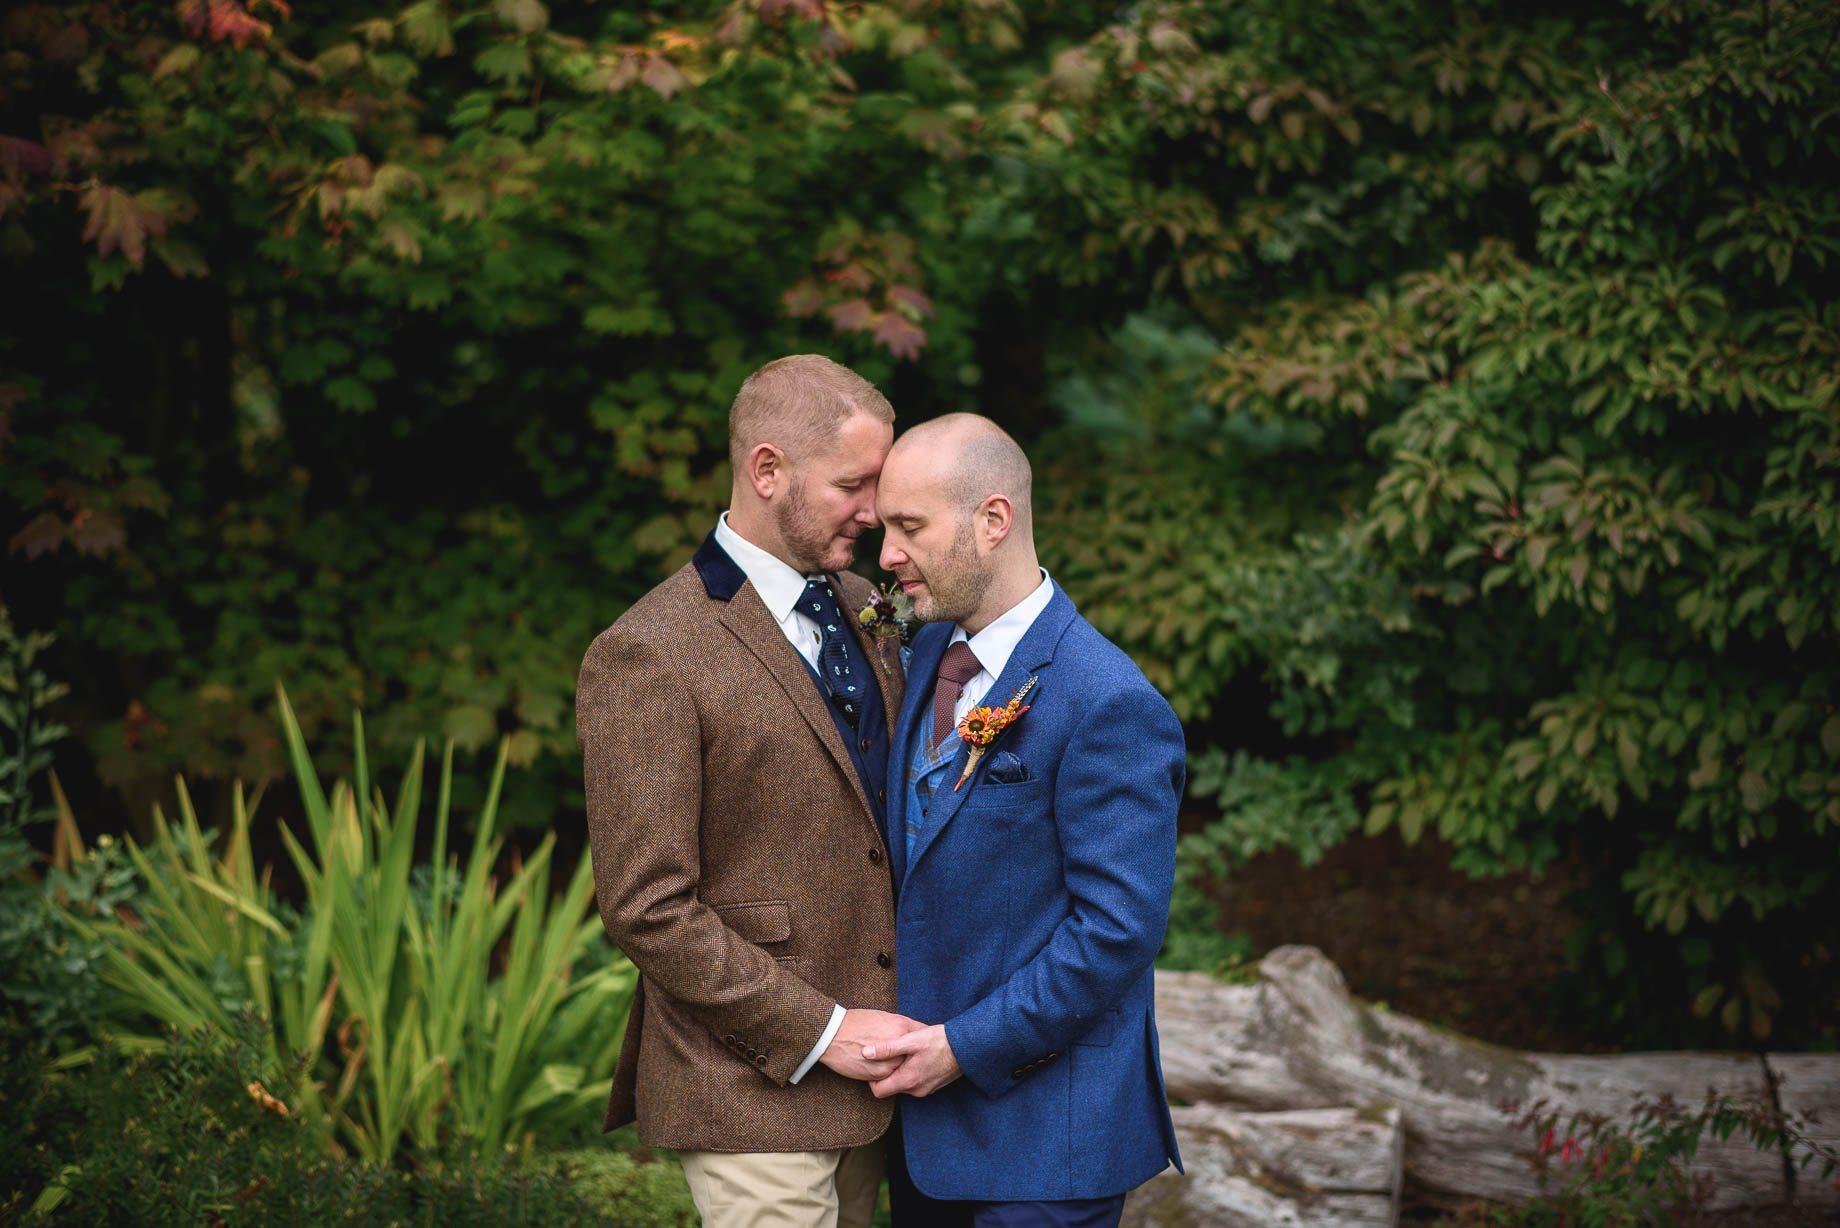 Wasing Park wedding photography - Ben + Stephen